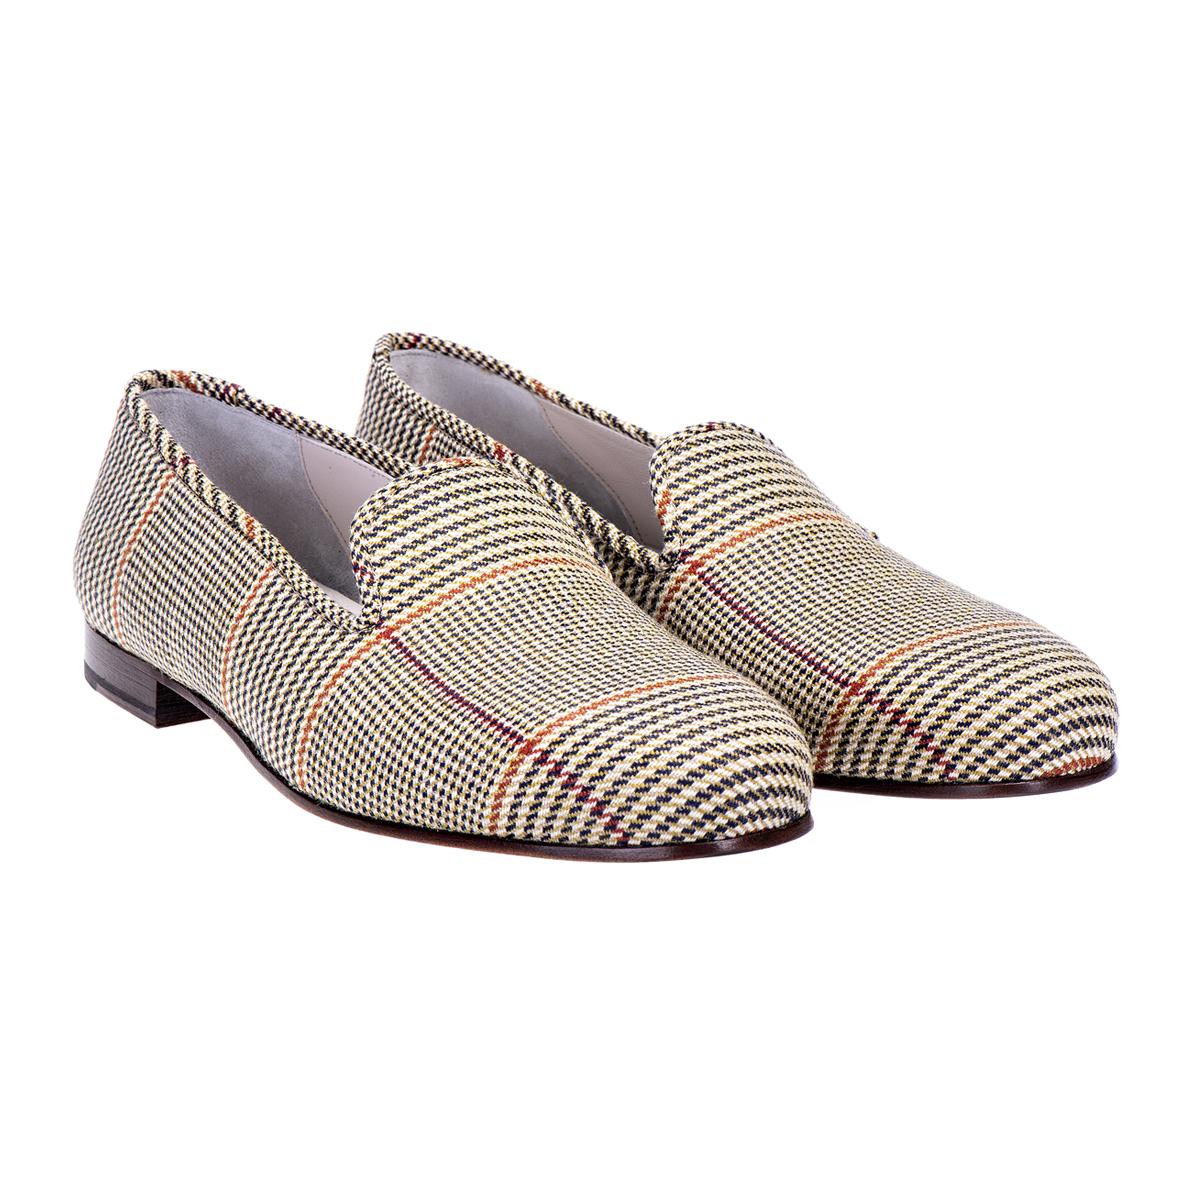 Russell Tweed Slippers